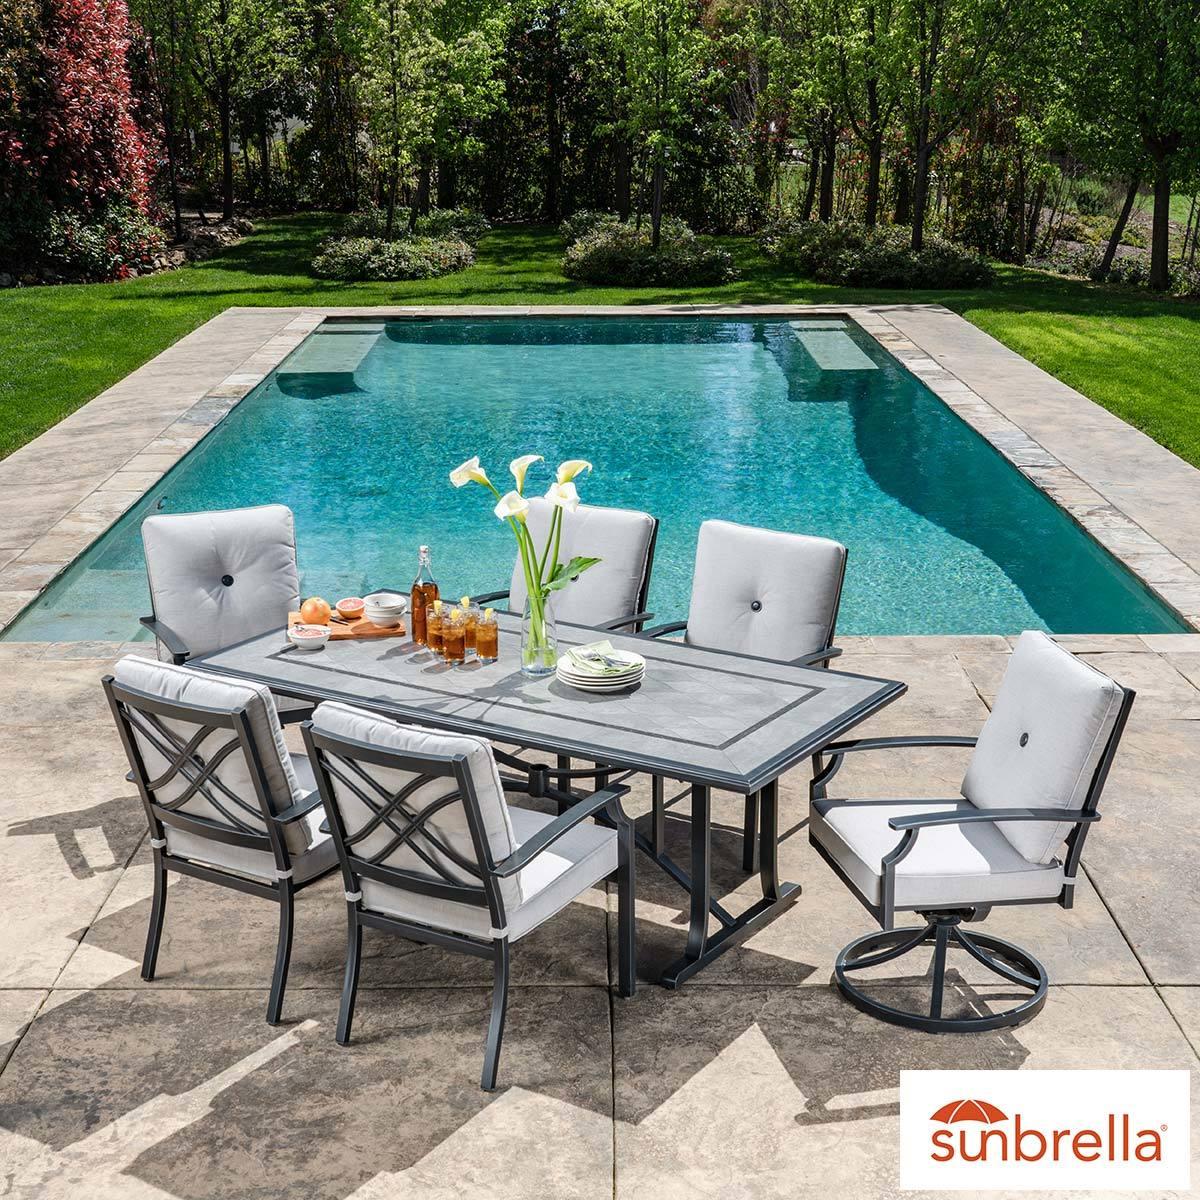 sunvilla hamilton 7 piece cushions dining patio set cover costco uk